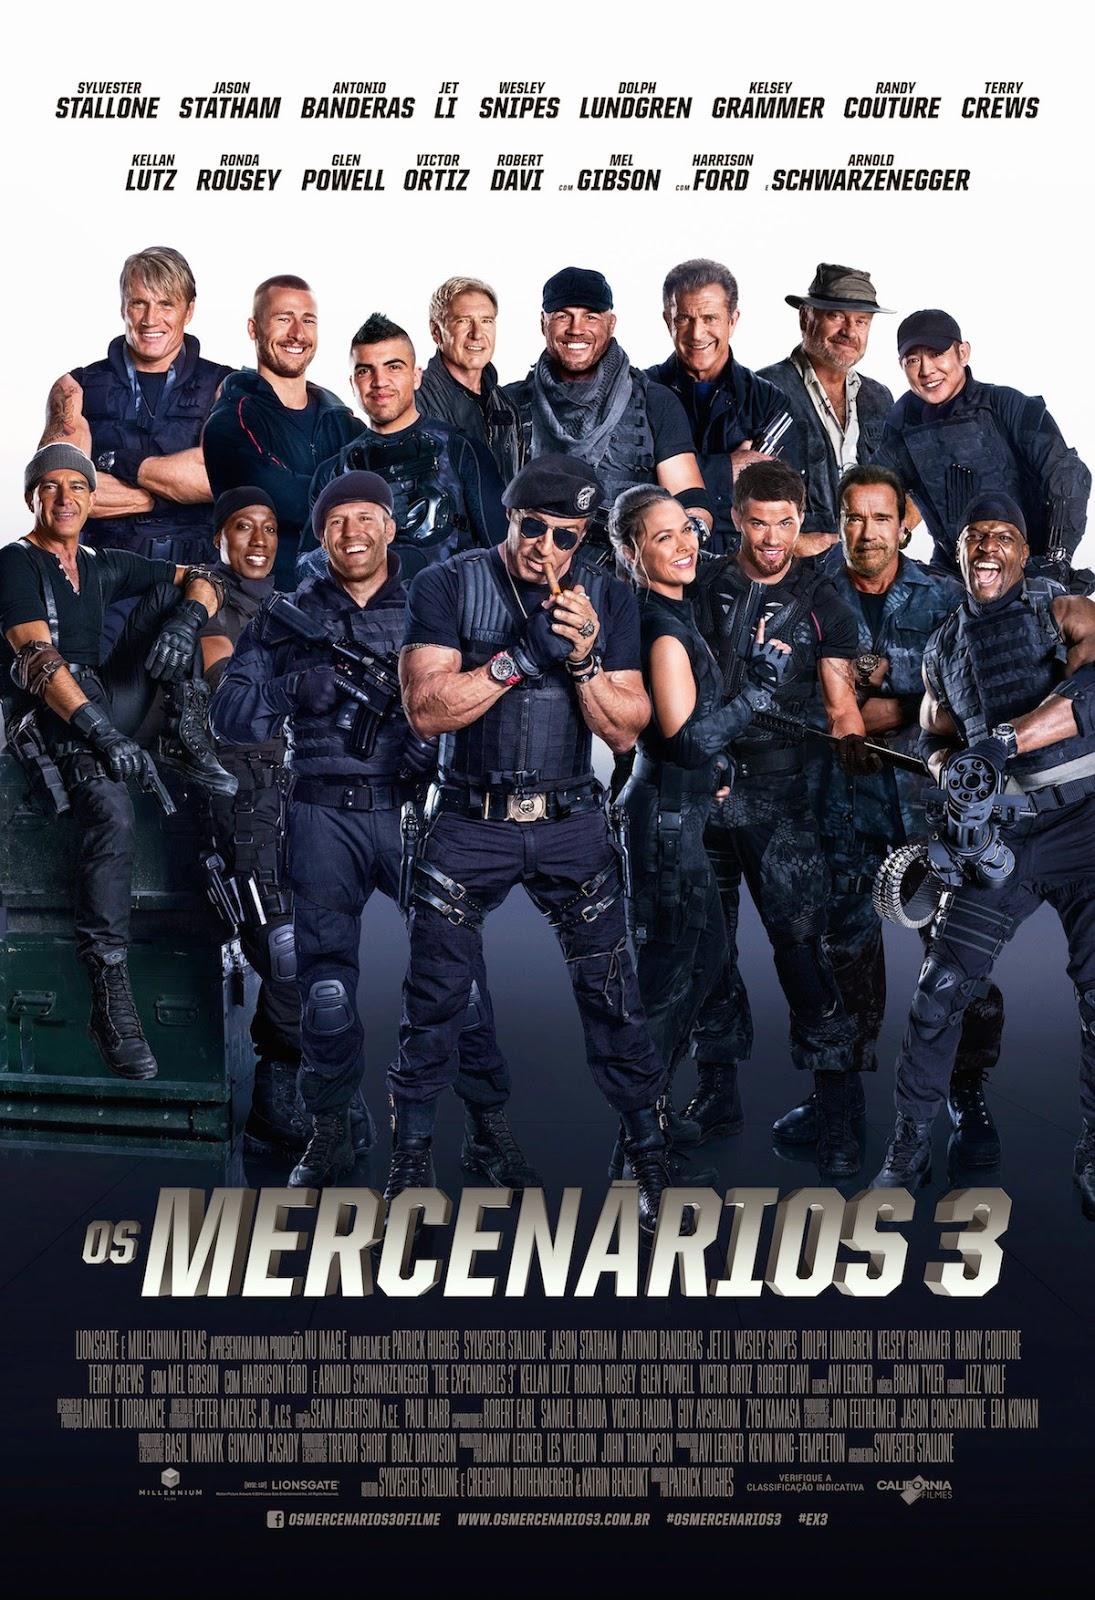 Baixar Filmes No Torrent Download Os Mercenarios 3 The Expendables 3 Avi Duau Audio 2014 Torrent